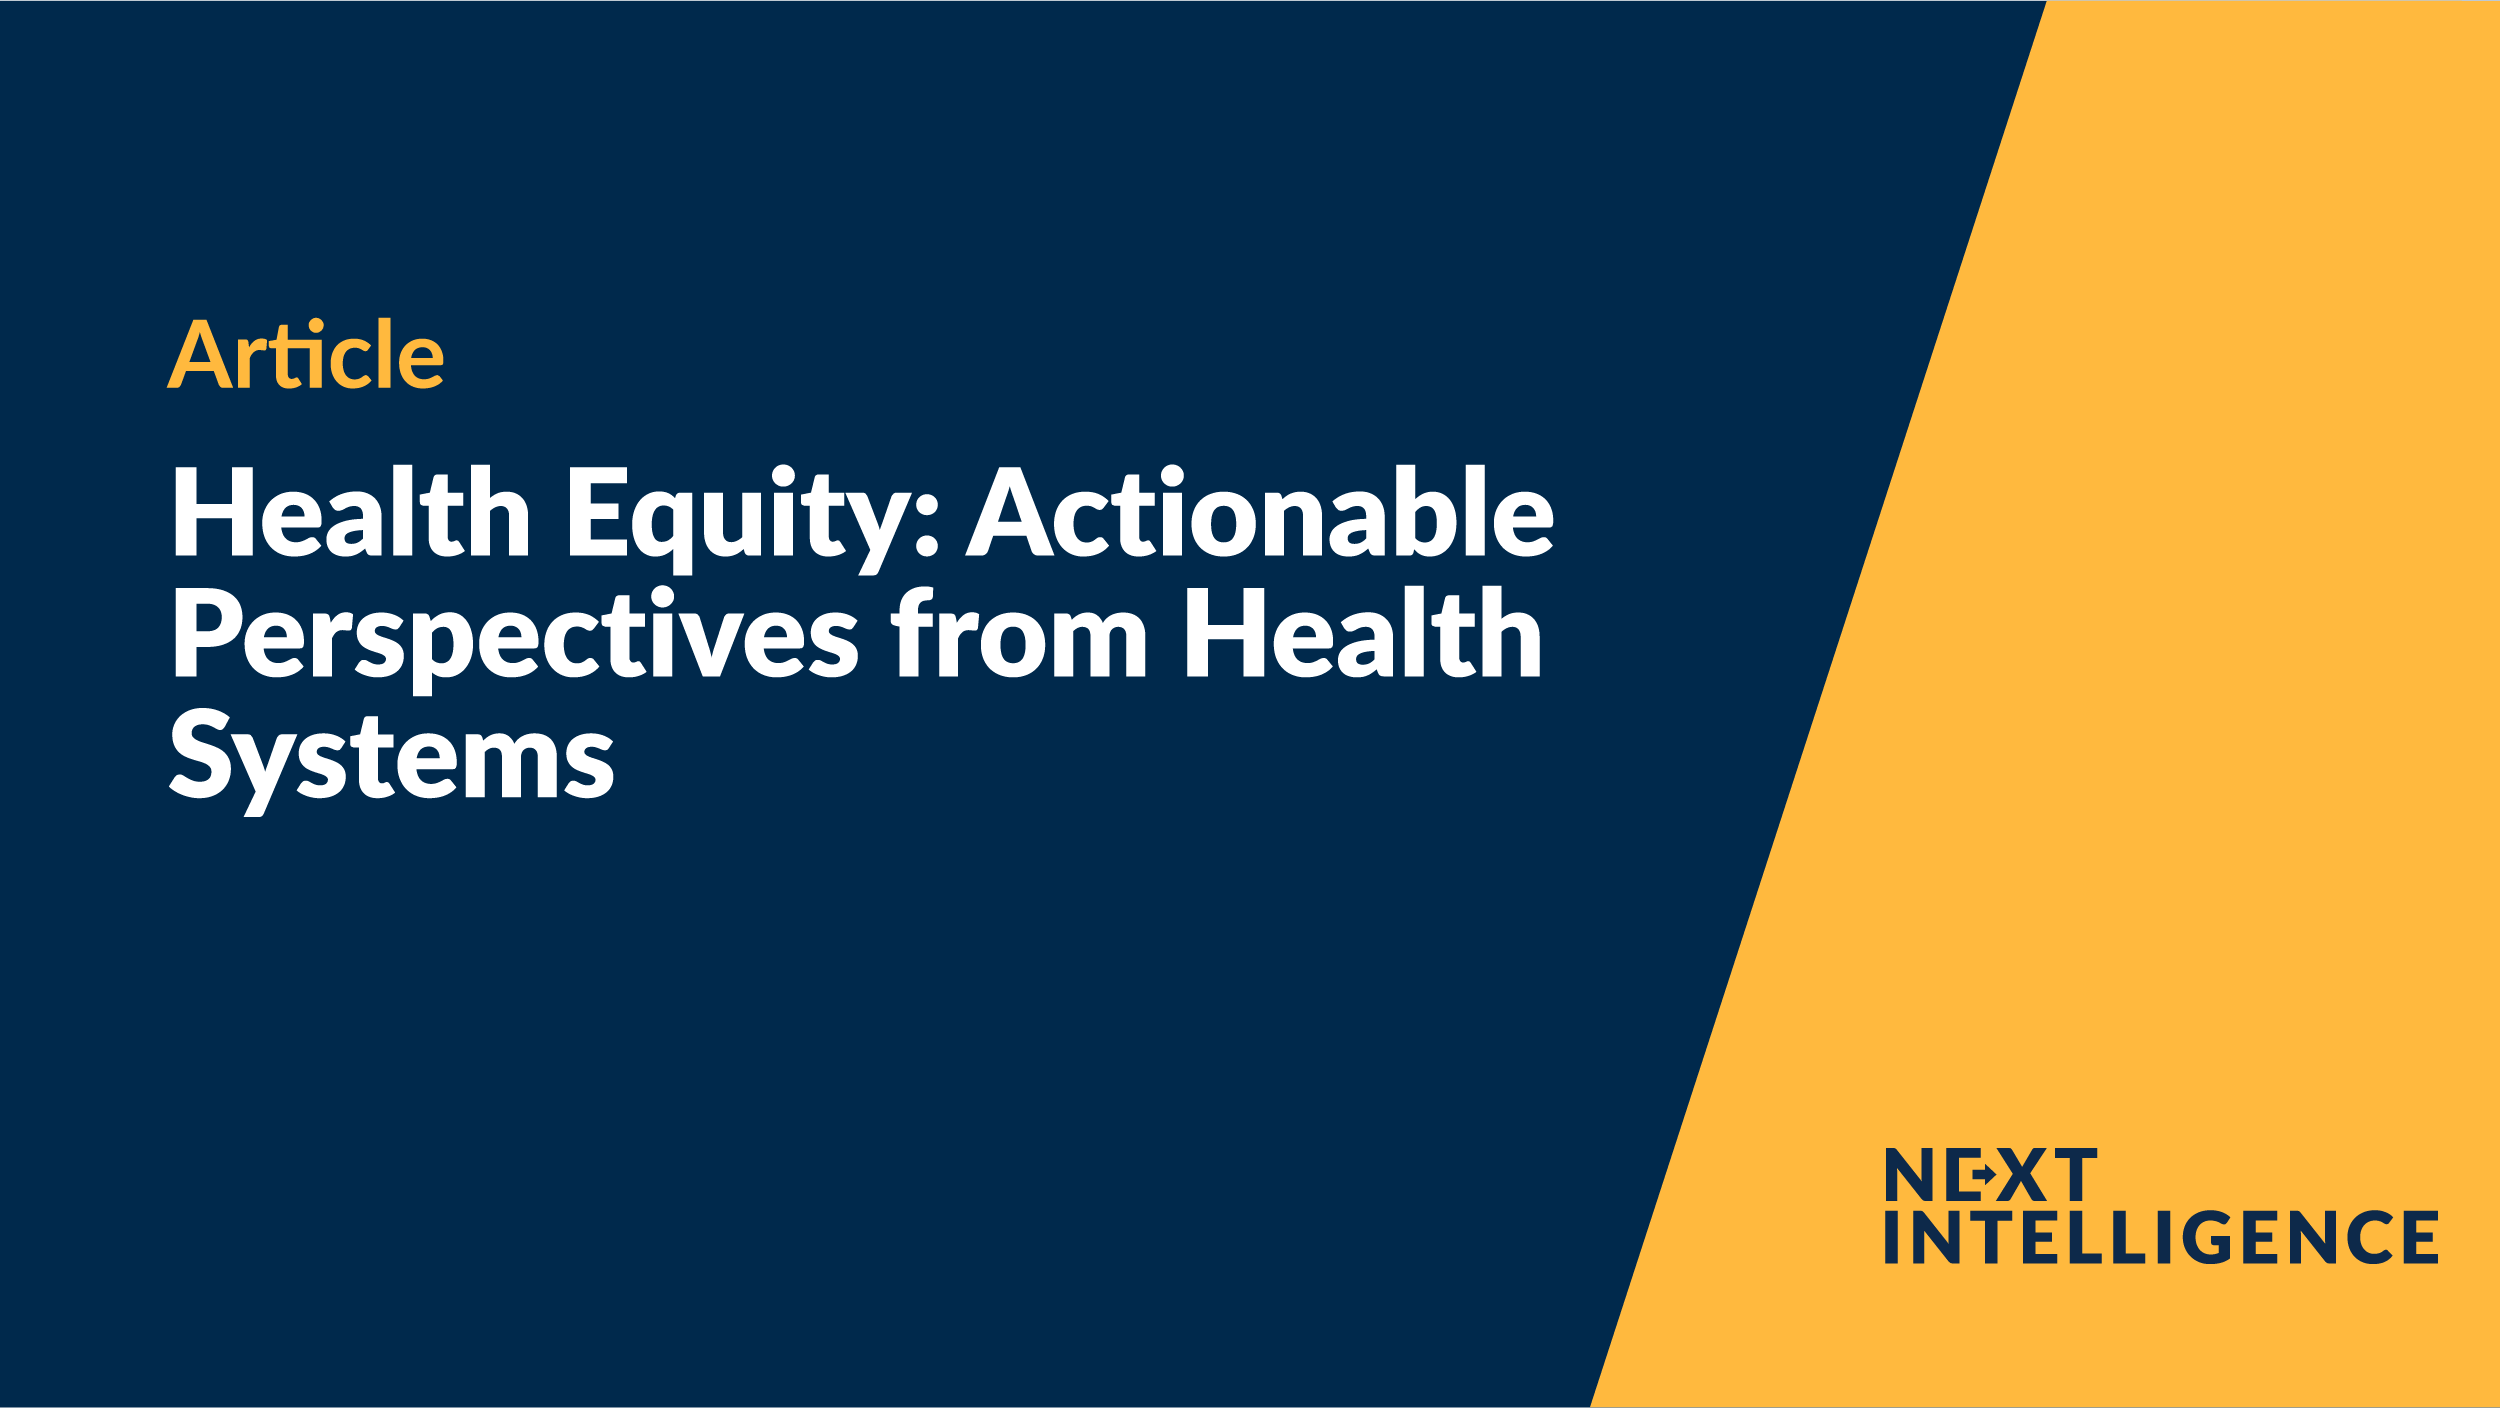 healthequity-01